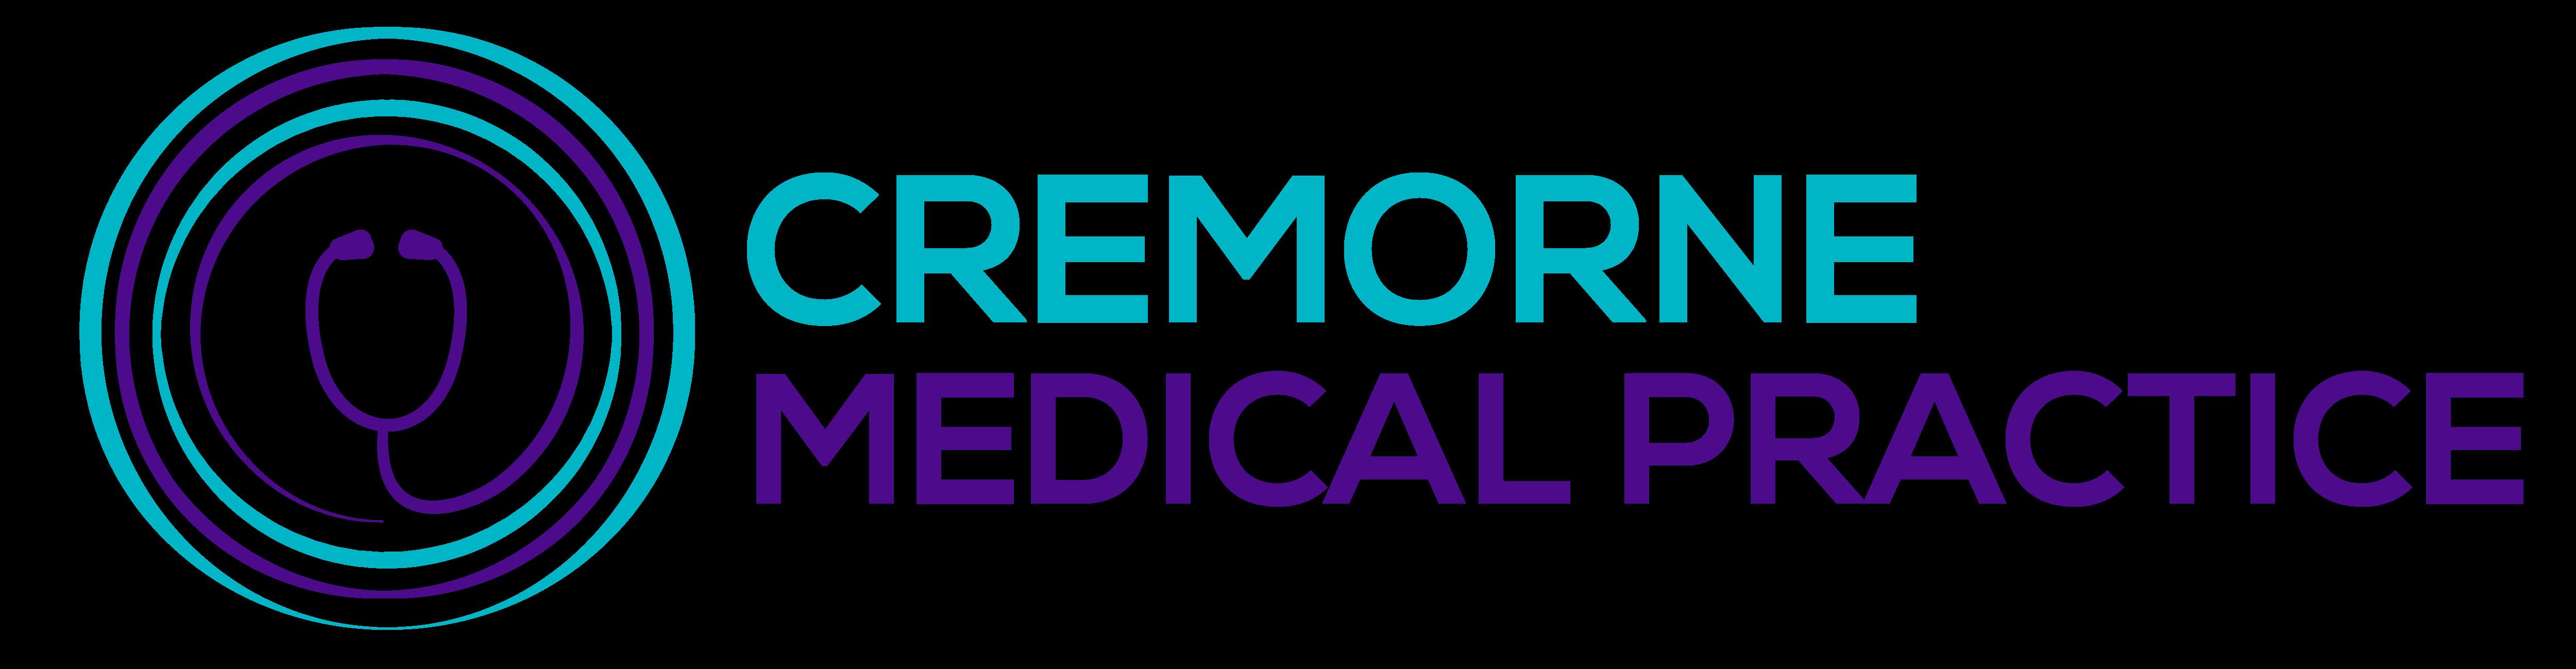 Cremorne Medical Practice